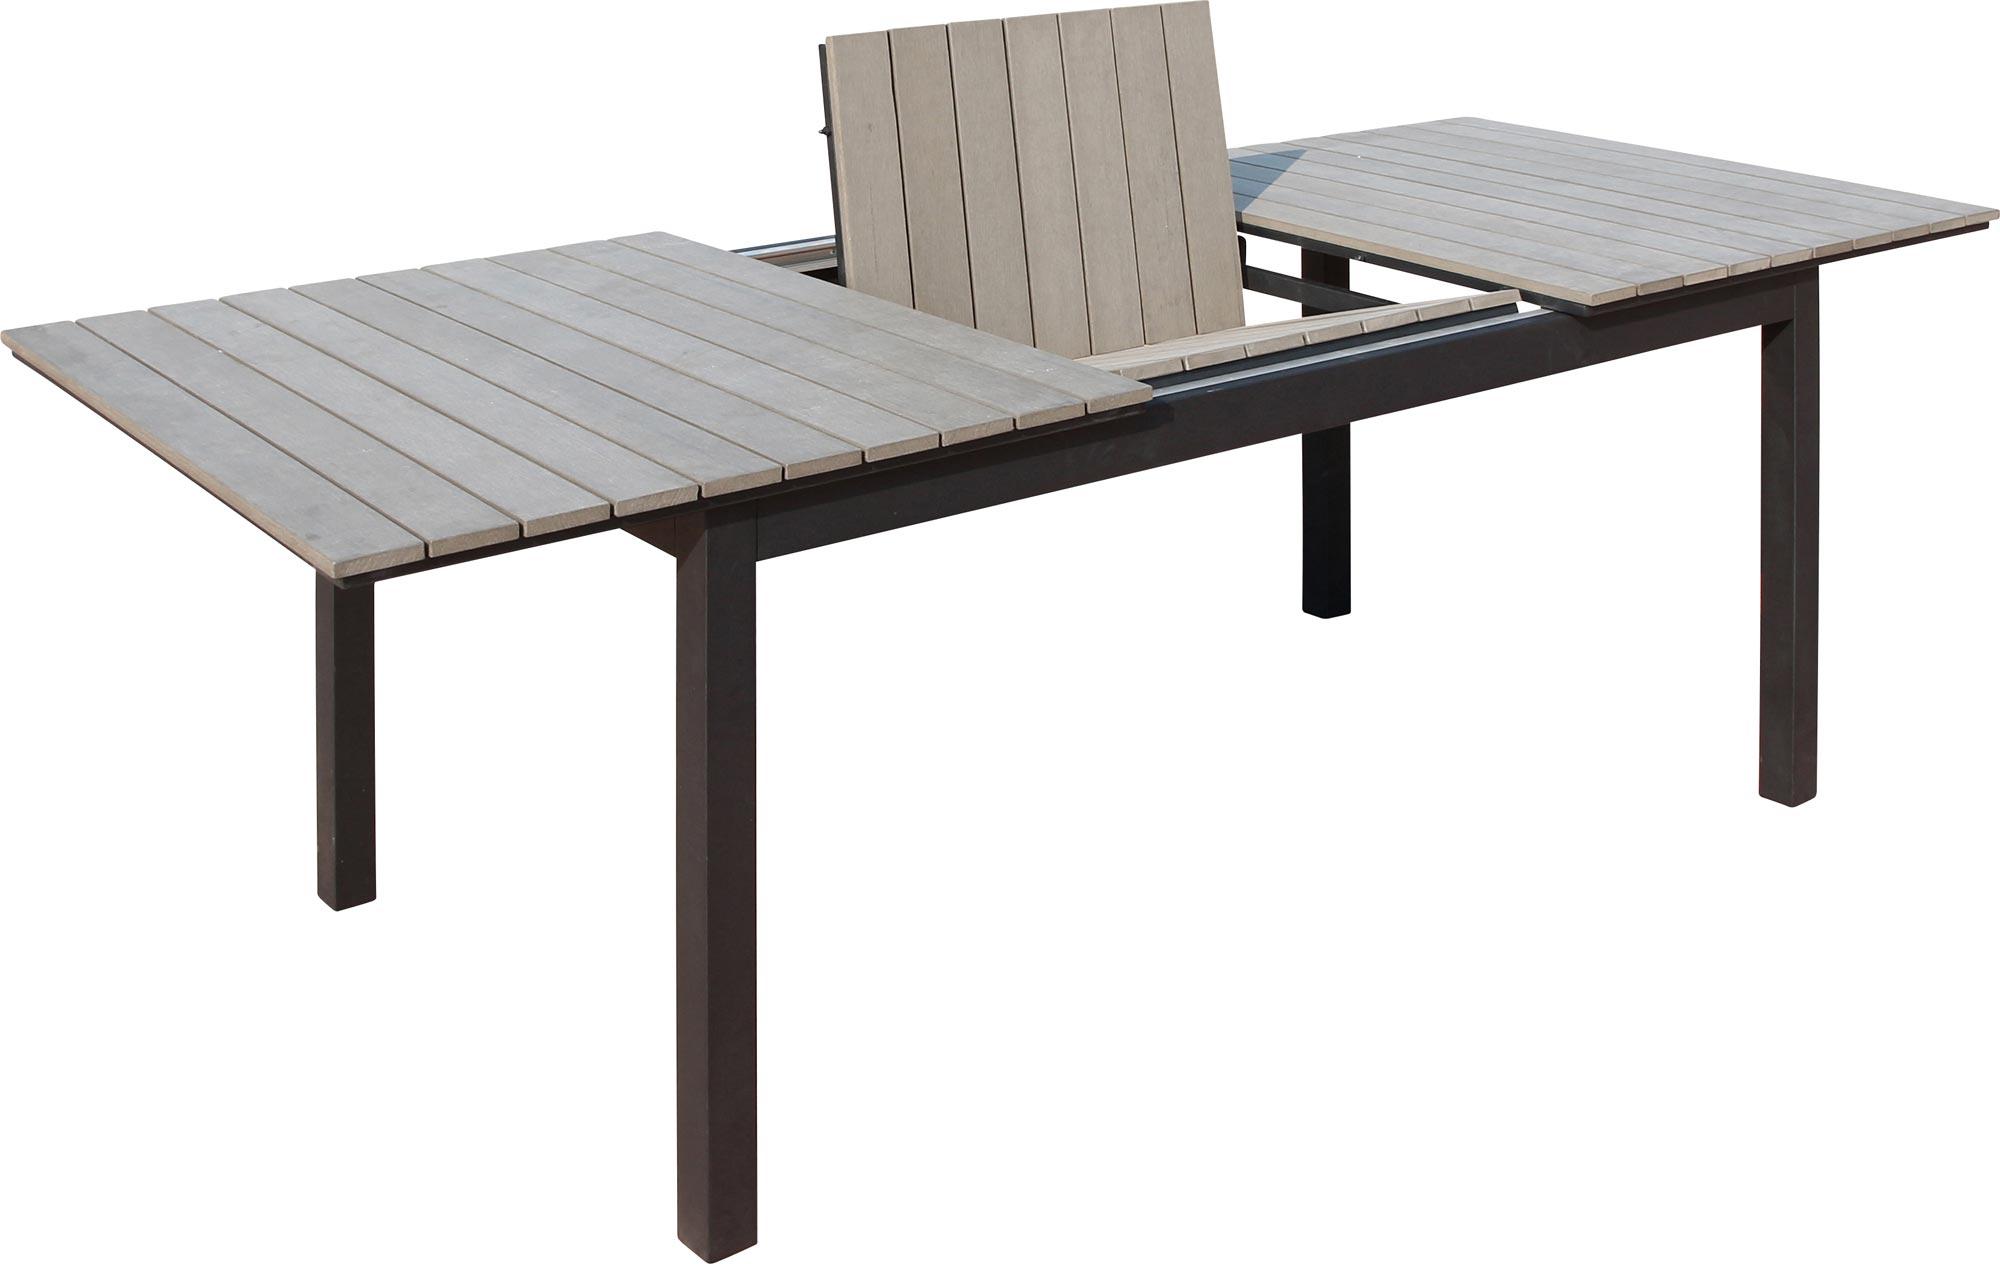 diplomat polywood m ausziehtisch gartengarnitur. Black Bedroom Furniture Sets. Home Design Ideas